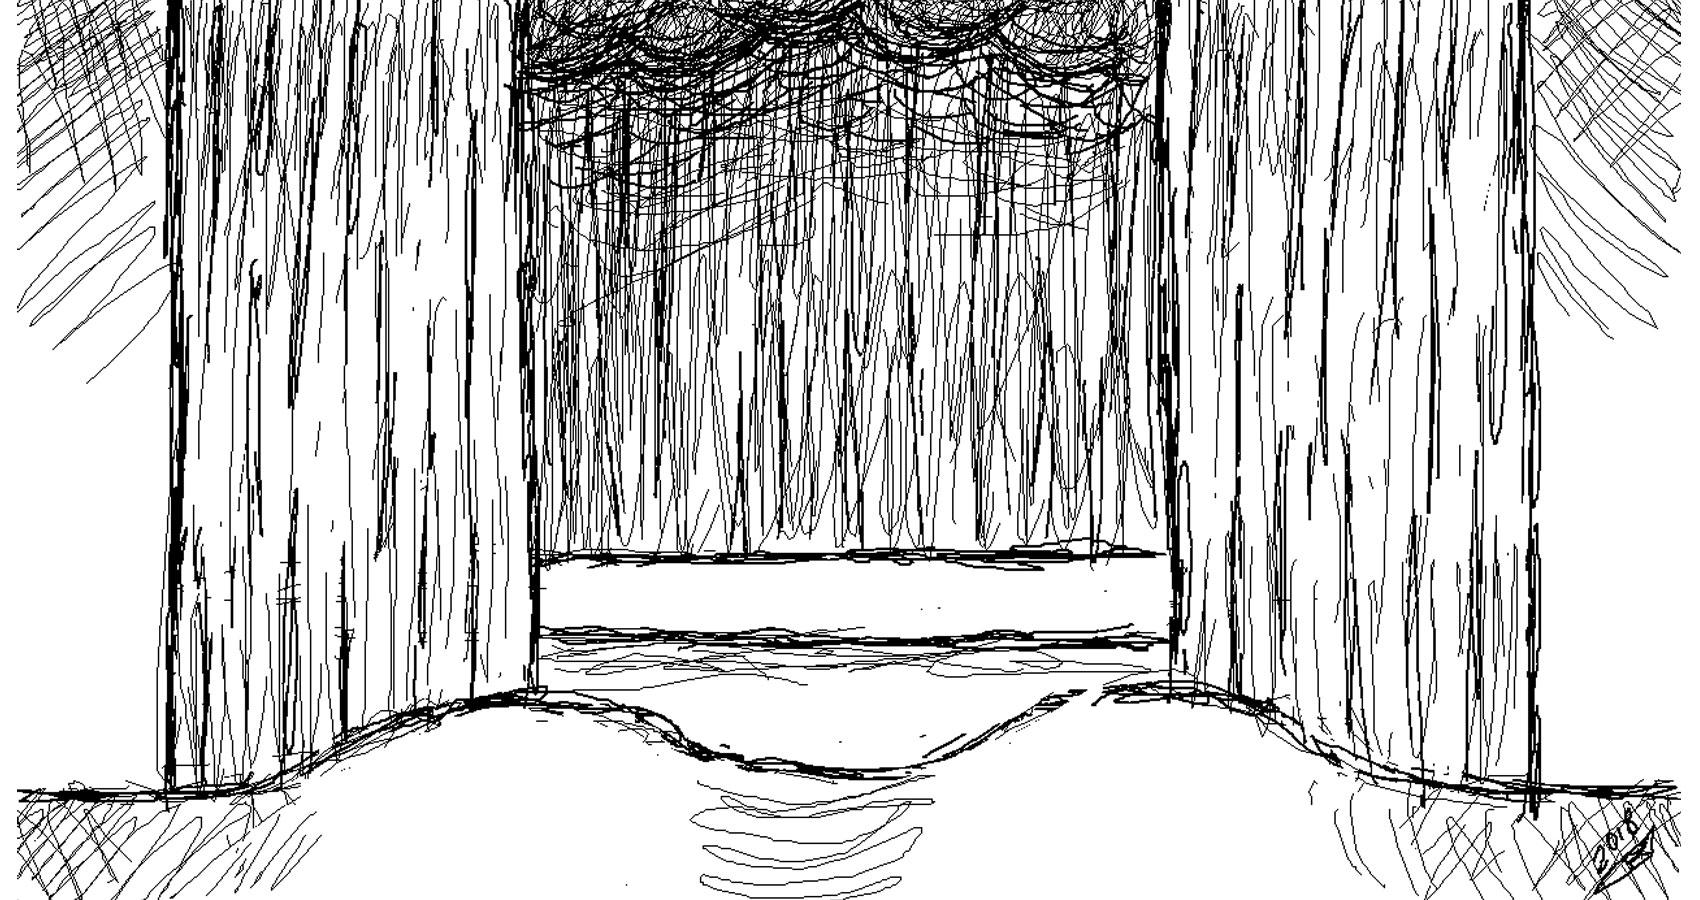 Rainy Saturday by Robyn MacKinnon at Spillwords.com